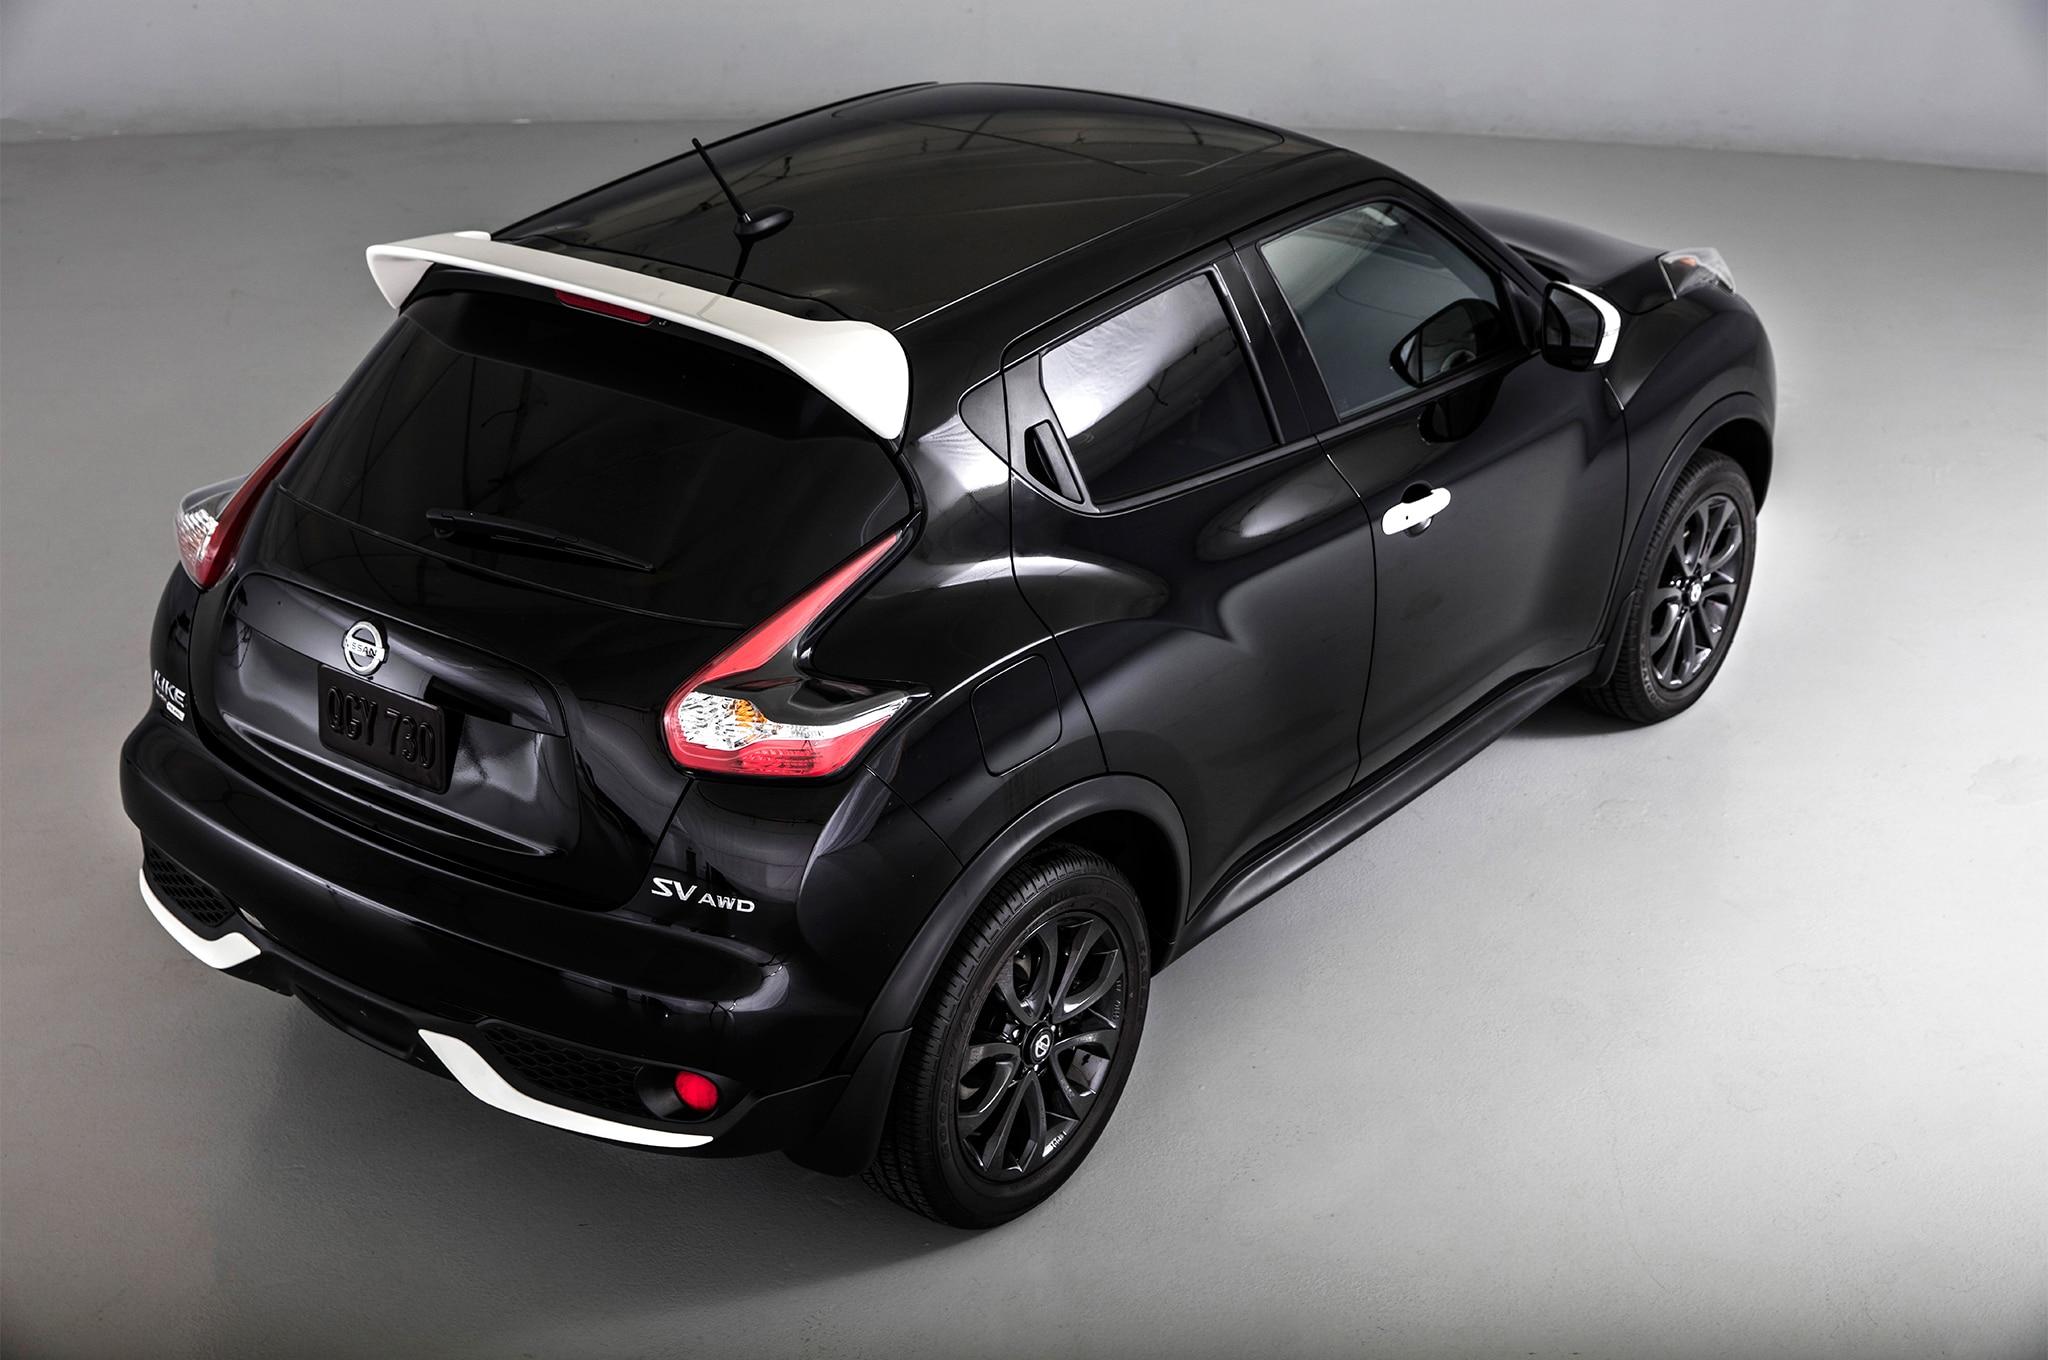 2017-Nissan-Juke-Black-Pearl-Edition-rear-three-quarter-02-24